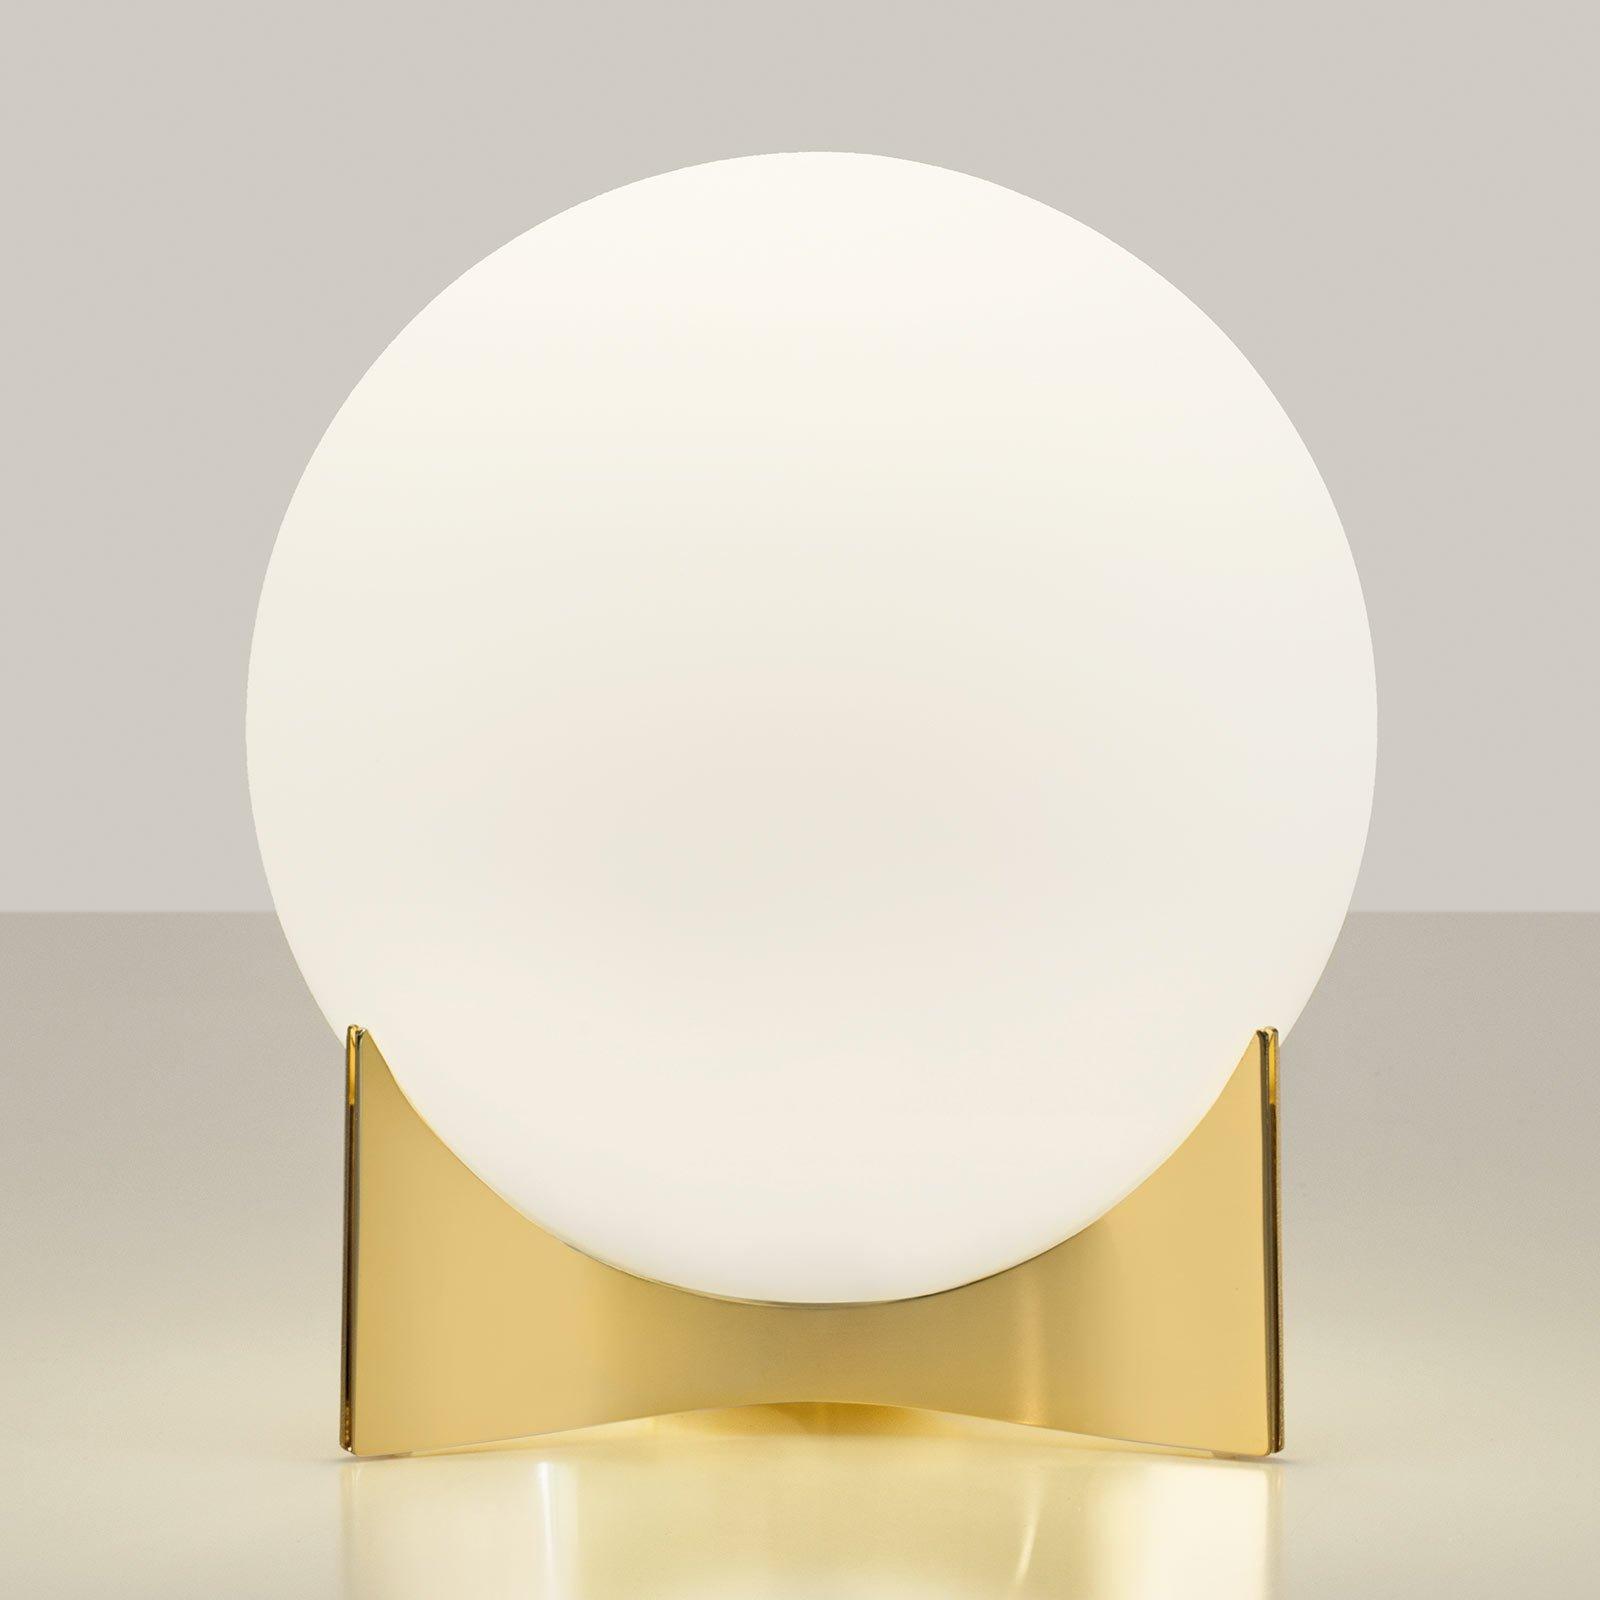 Terzani Oscar bordlampe av glass, gull